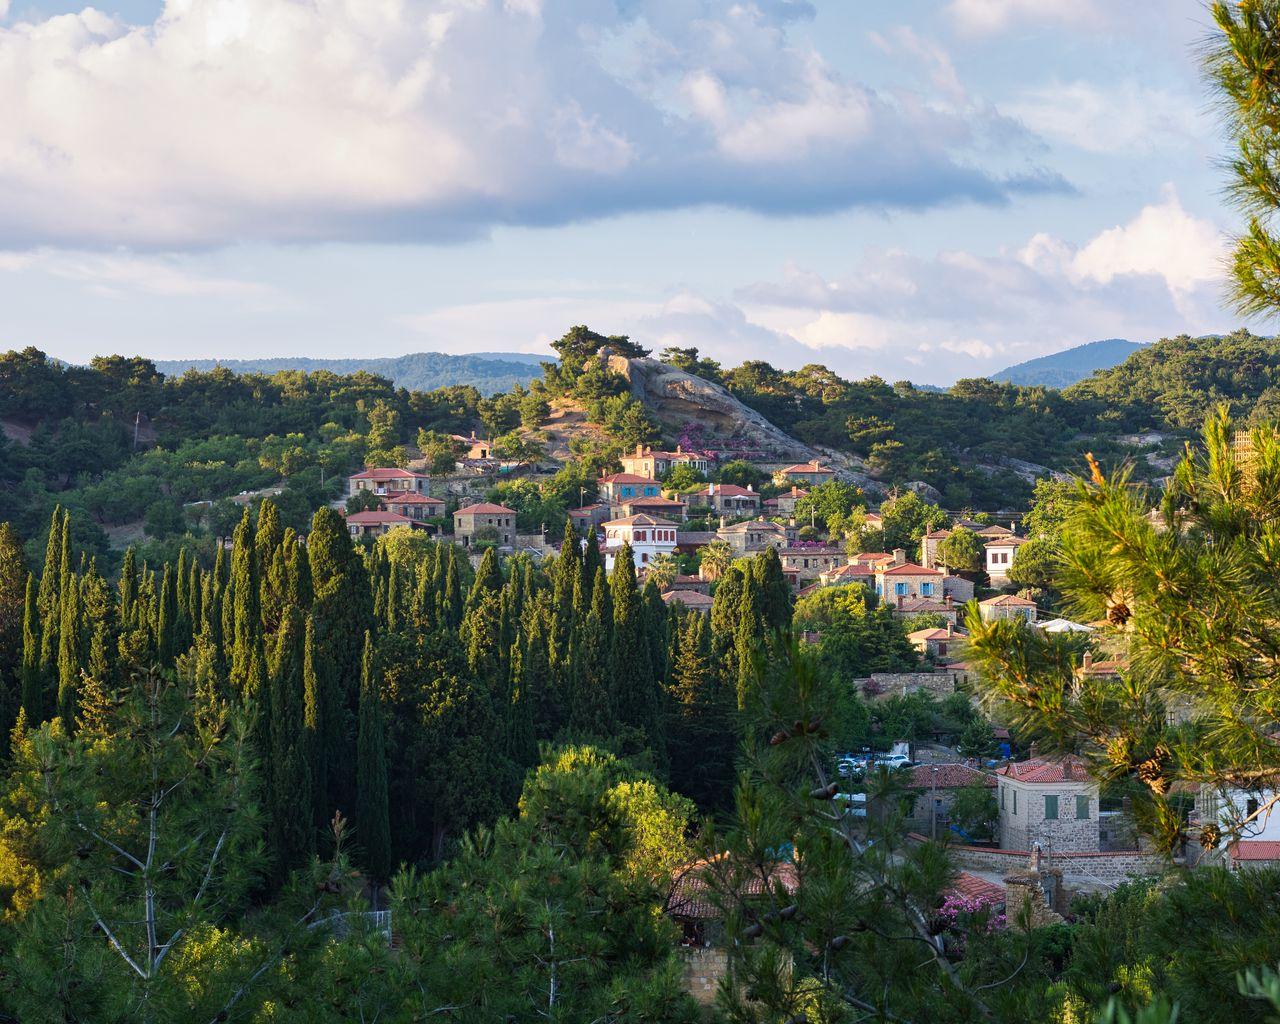 1280x1024 Wallpaper village, mountain, buildings, trees